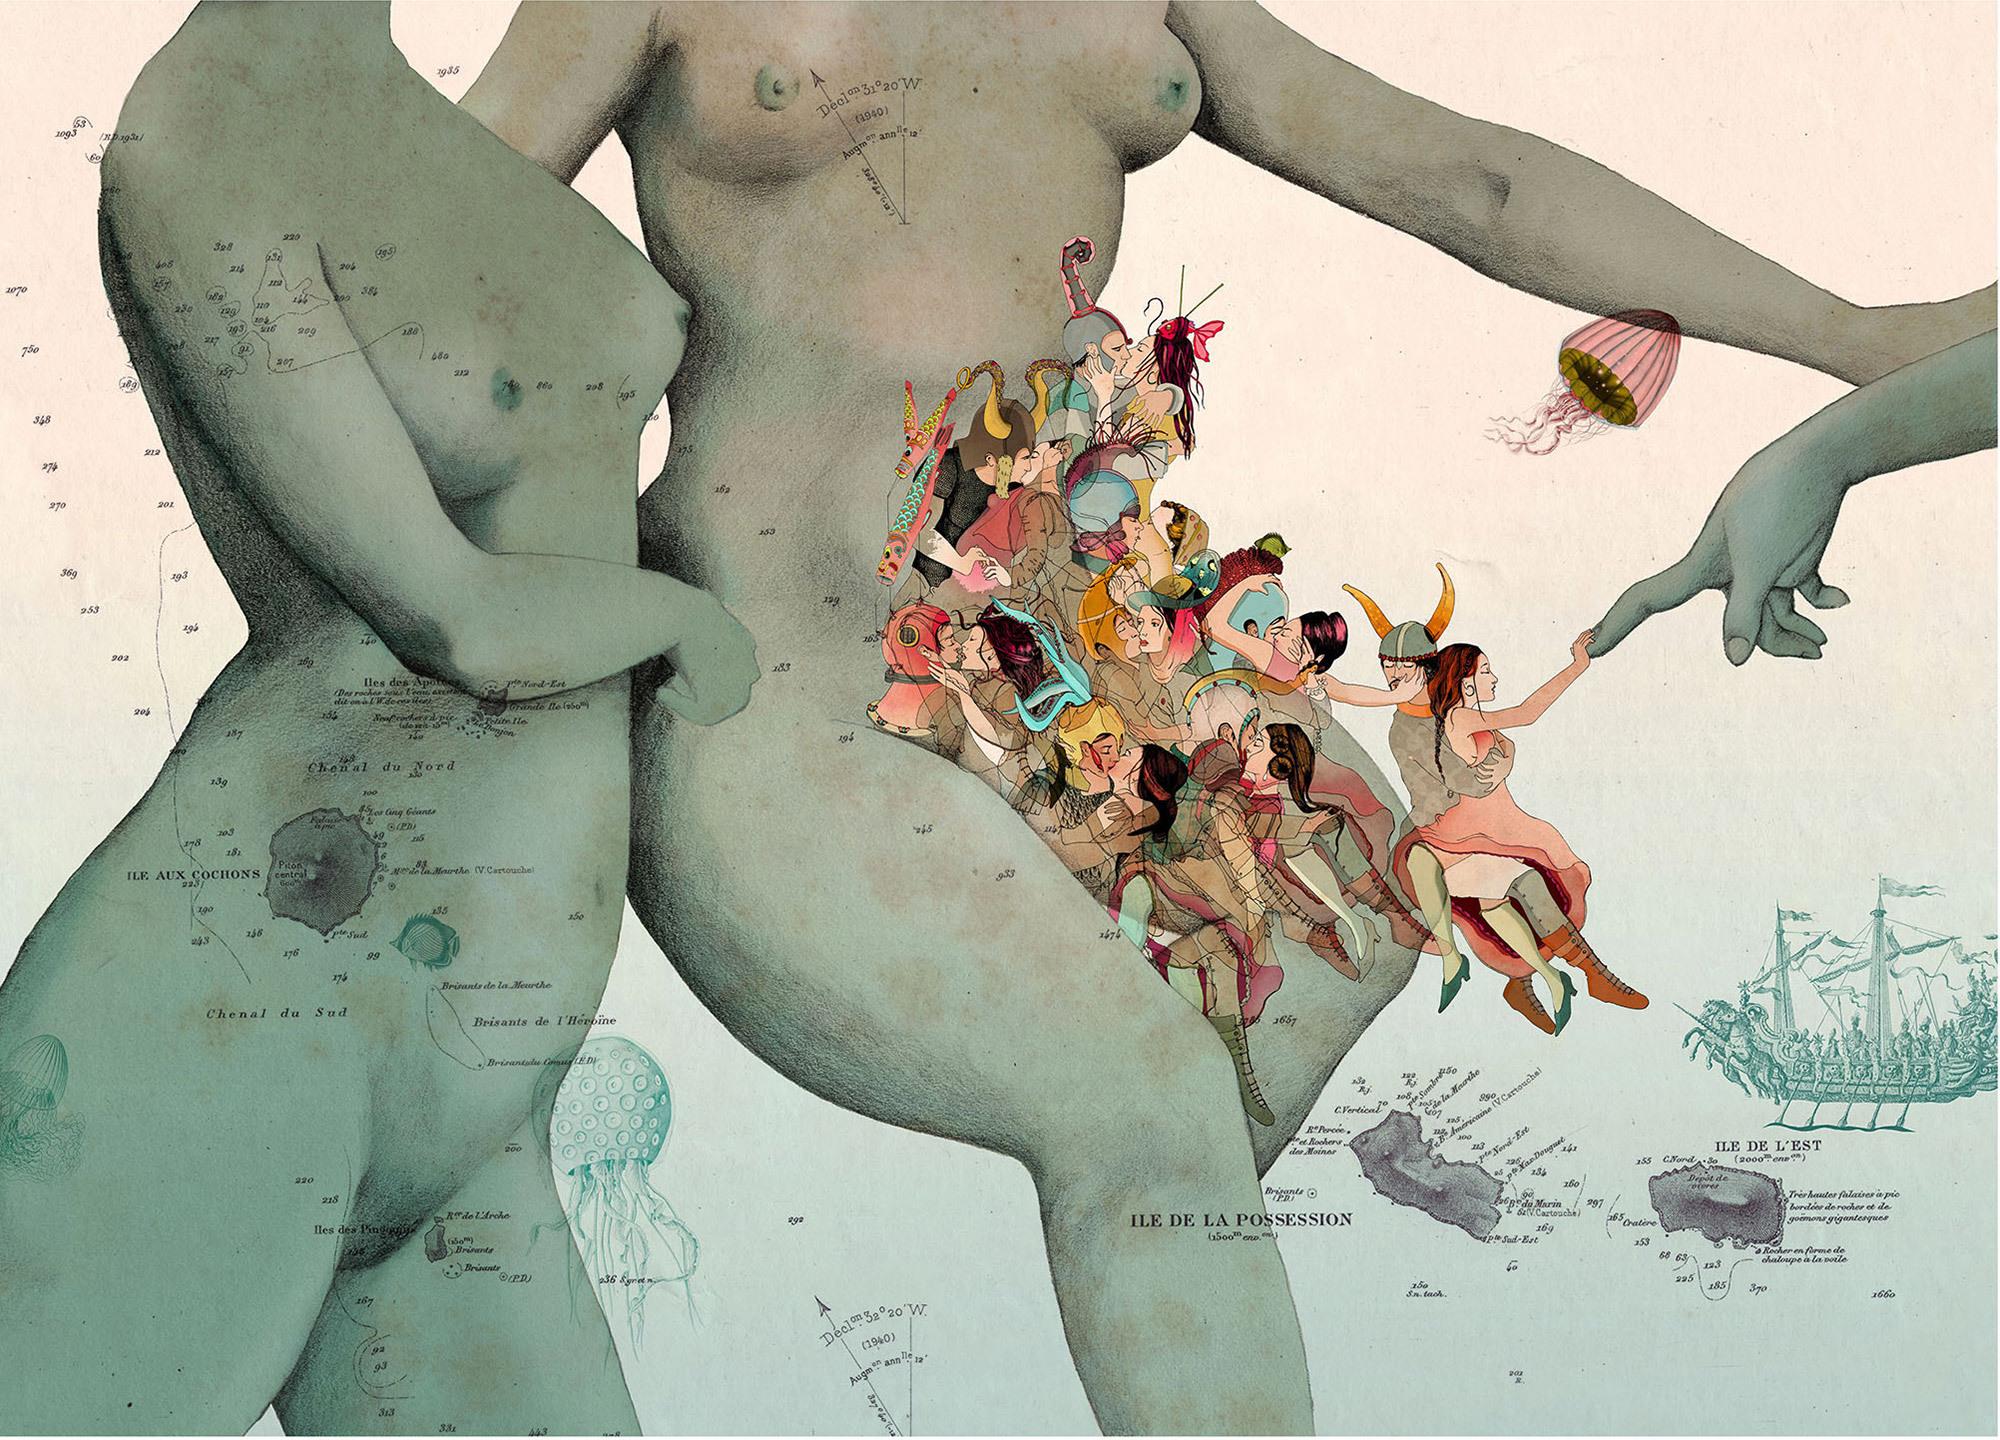 Resultado de imagem para Women's minds matter Déesse V Nine Goodbye Kisses by Delphine Lebourgeois